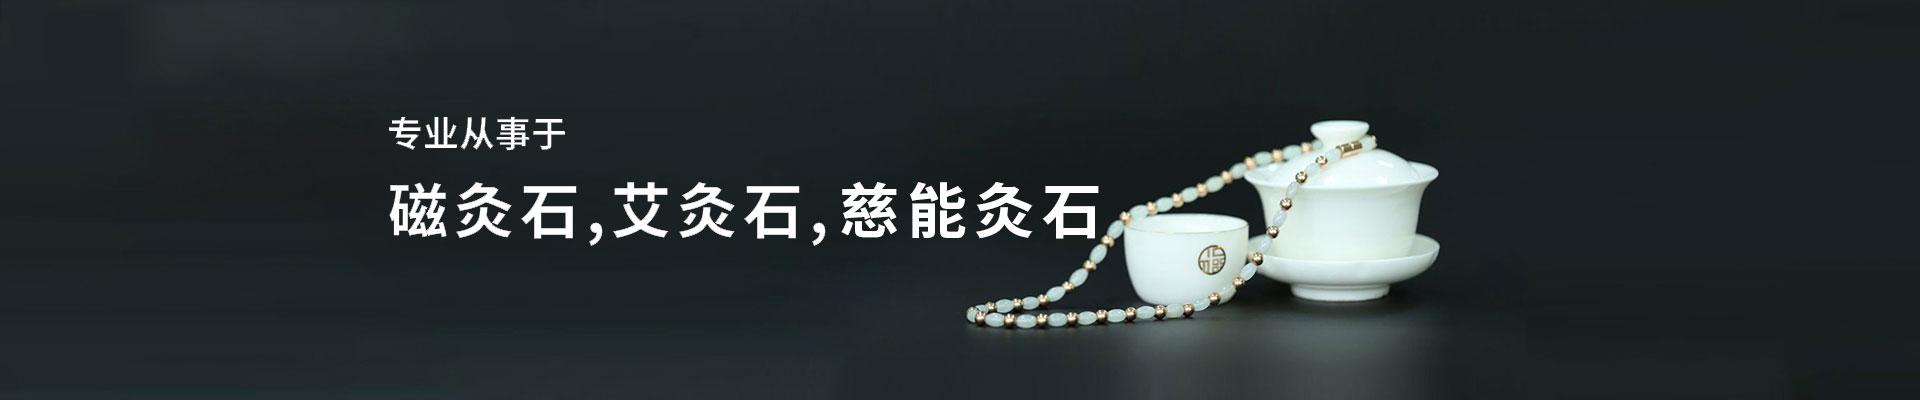 http://www.nbguorui.com/data/upload/202012/20201211091012_625.jpg